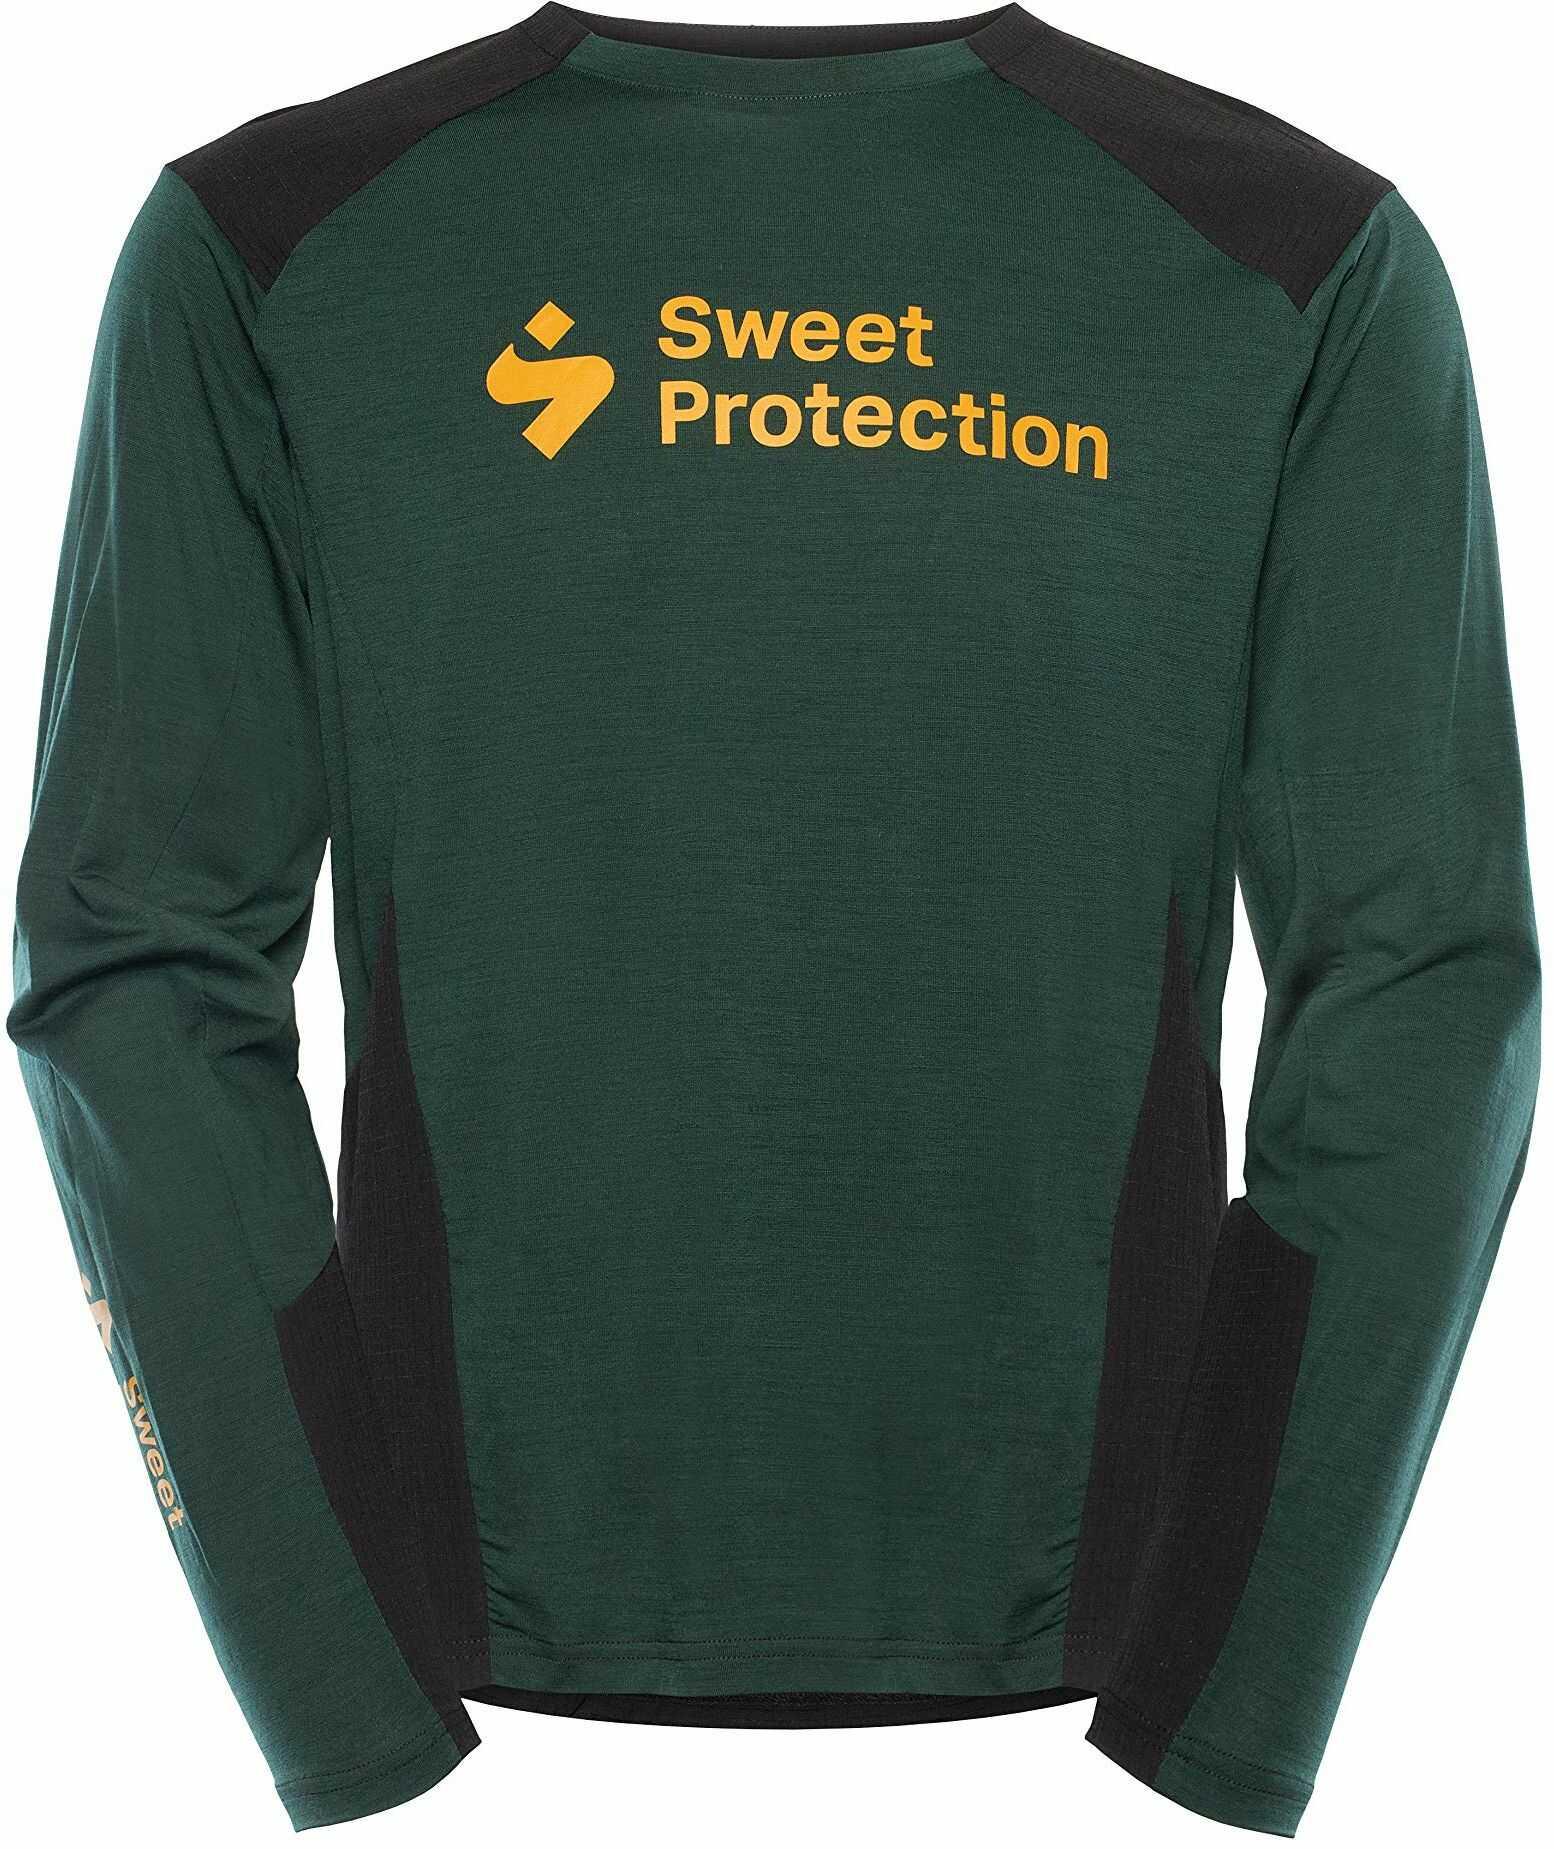 Sweet Protection Męska koszulka Hunter Merino Fusion Jersey, Forest Green, XL